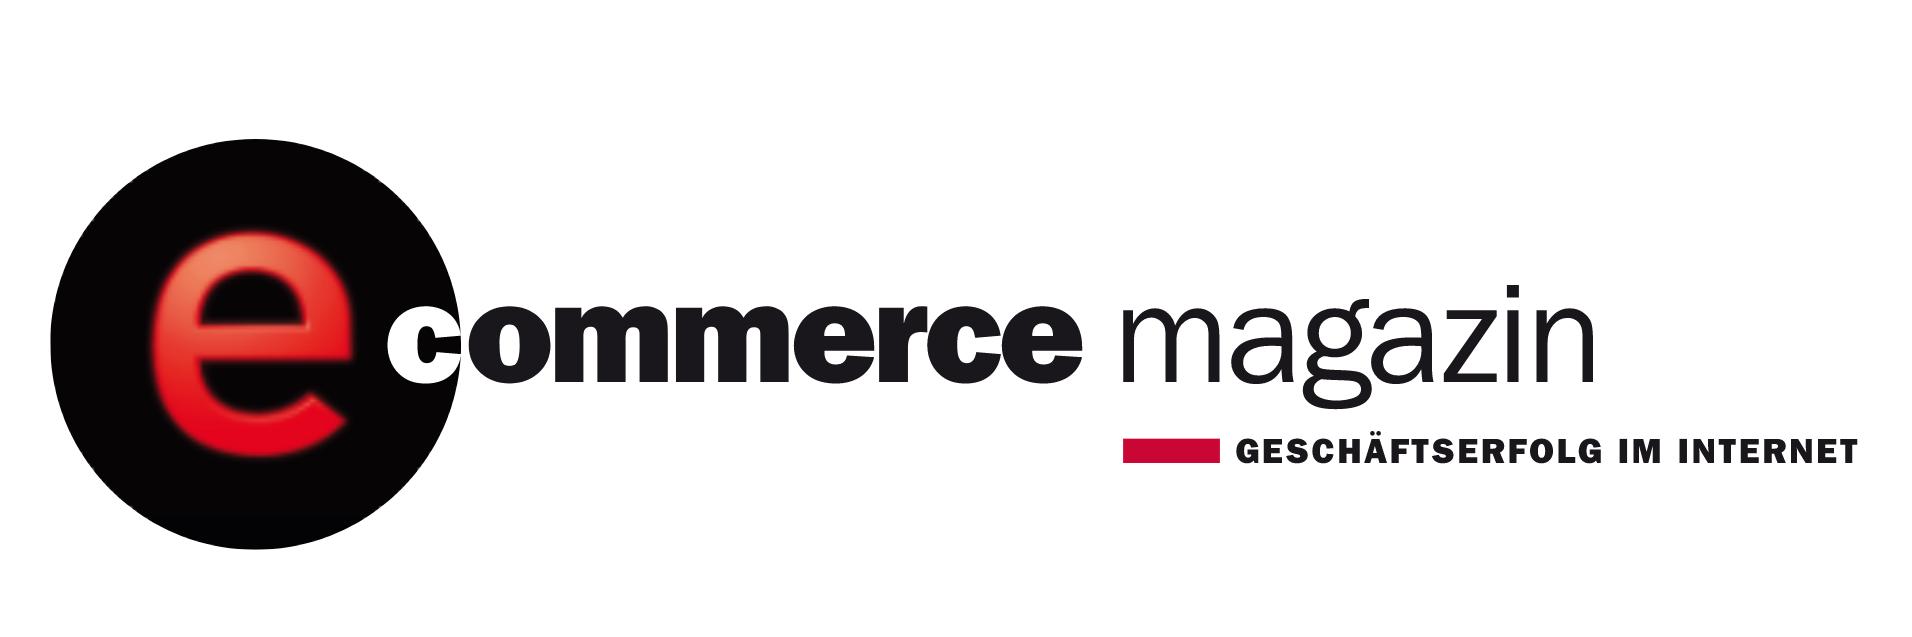 Ecommerce_Magazin_Home_Myos_Finanzierung_FBA